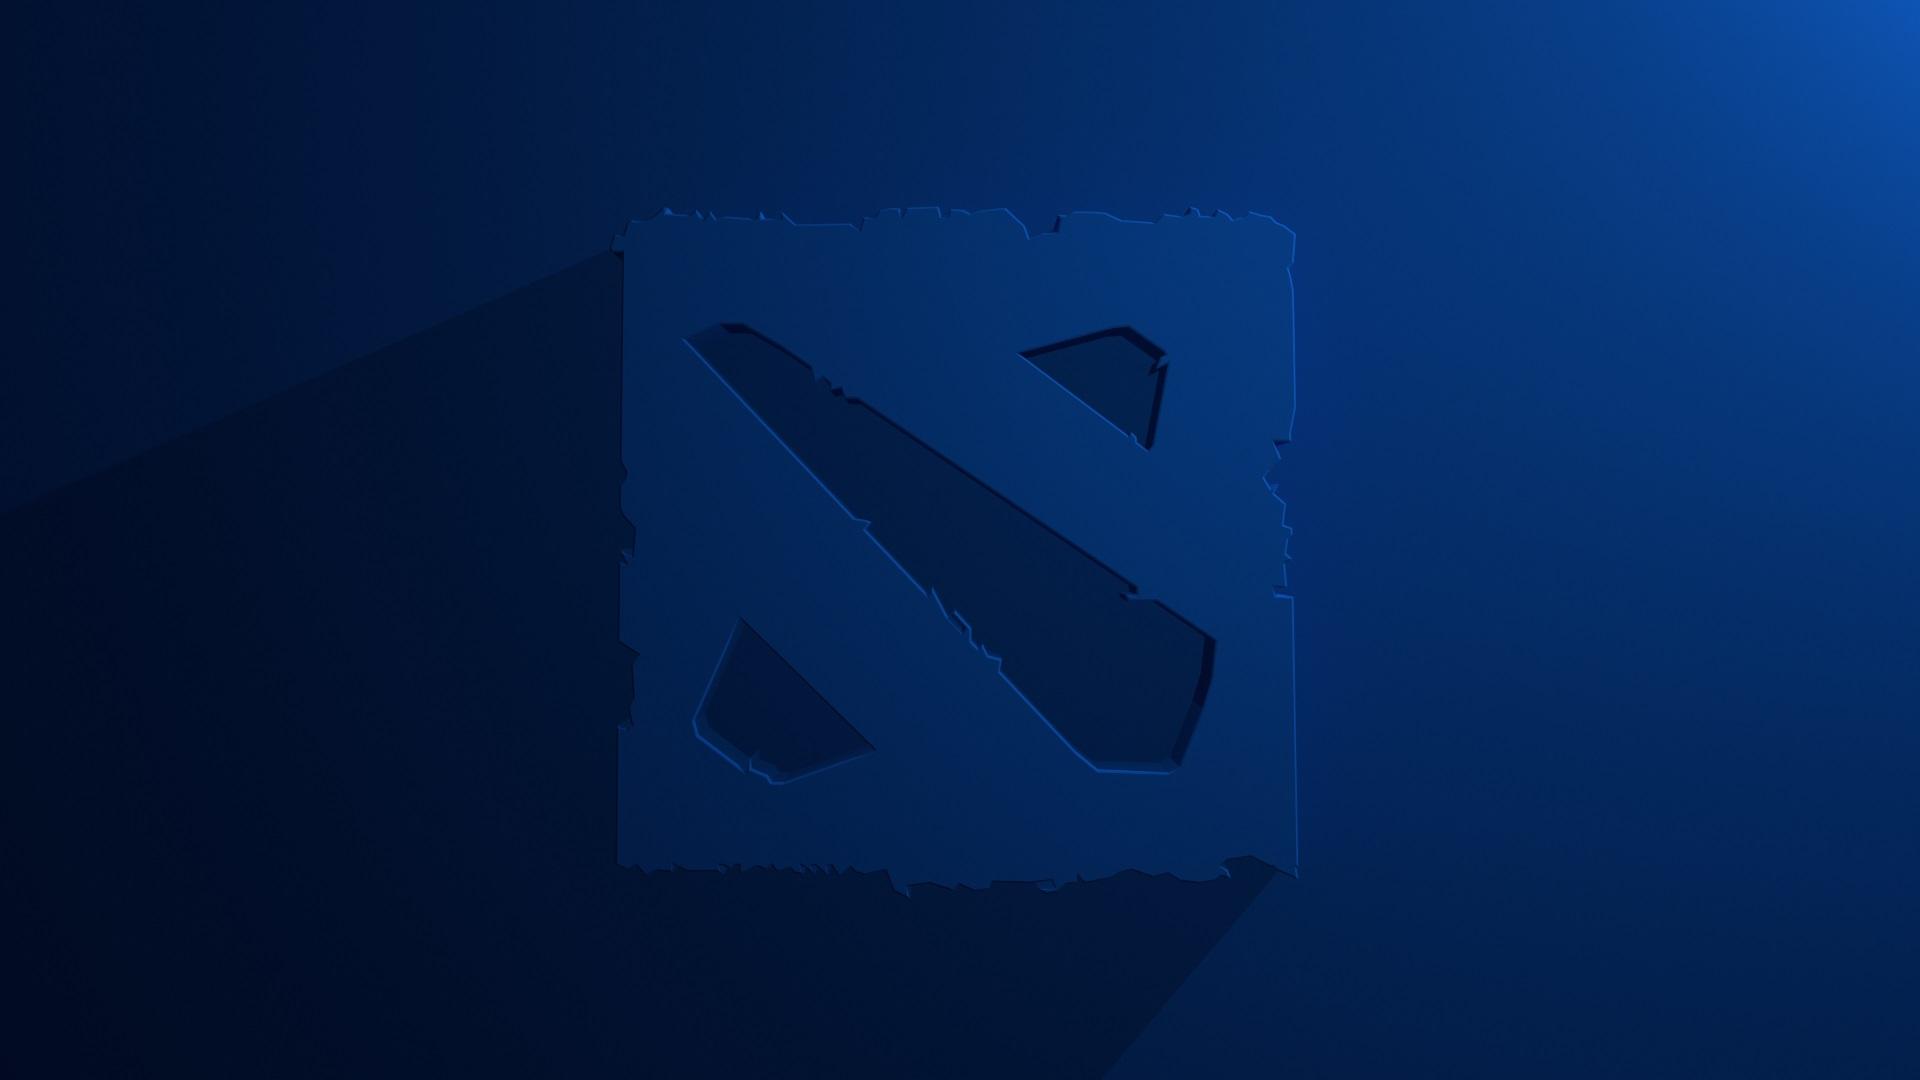 Dota 2 logo blue background, desktop photos | Wallpapers ...